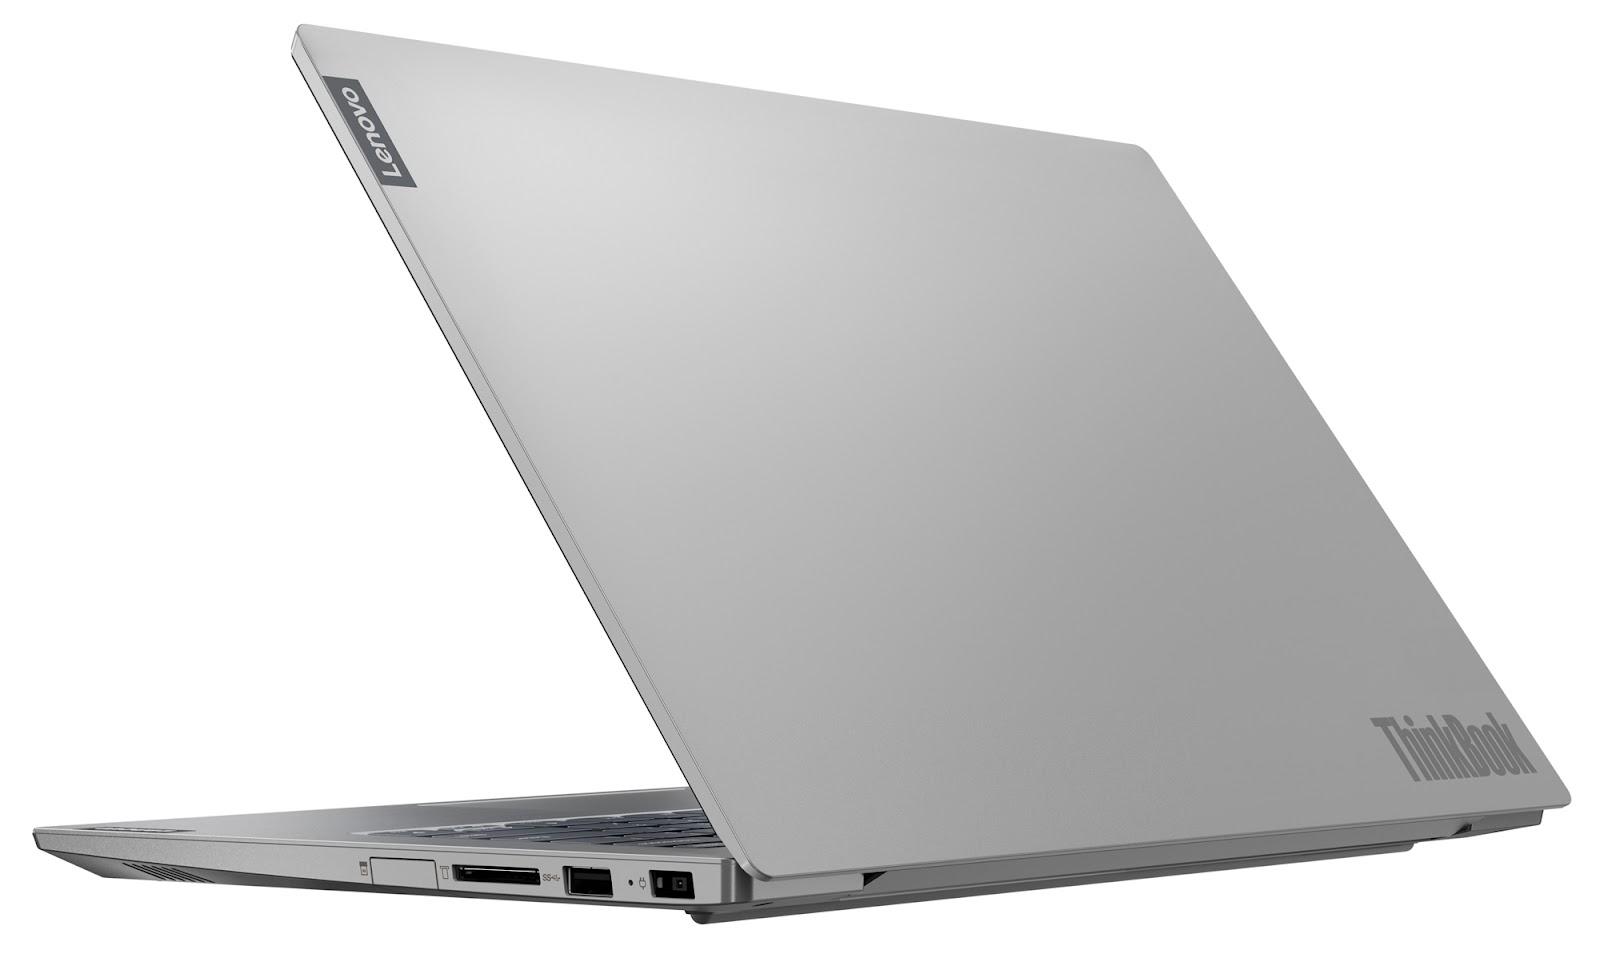 Фото 2. Ноутбук Lenovo ThinkBook 14-IIL (20SL002YRU)